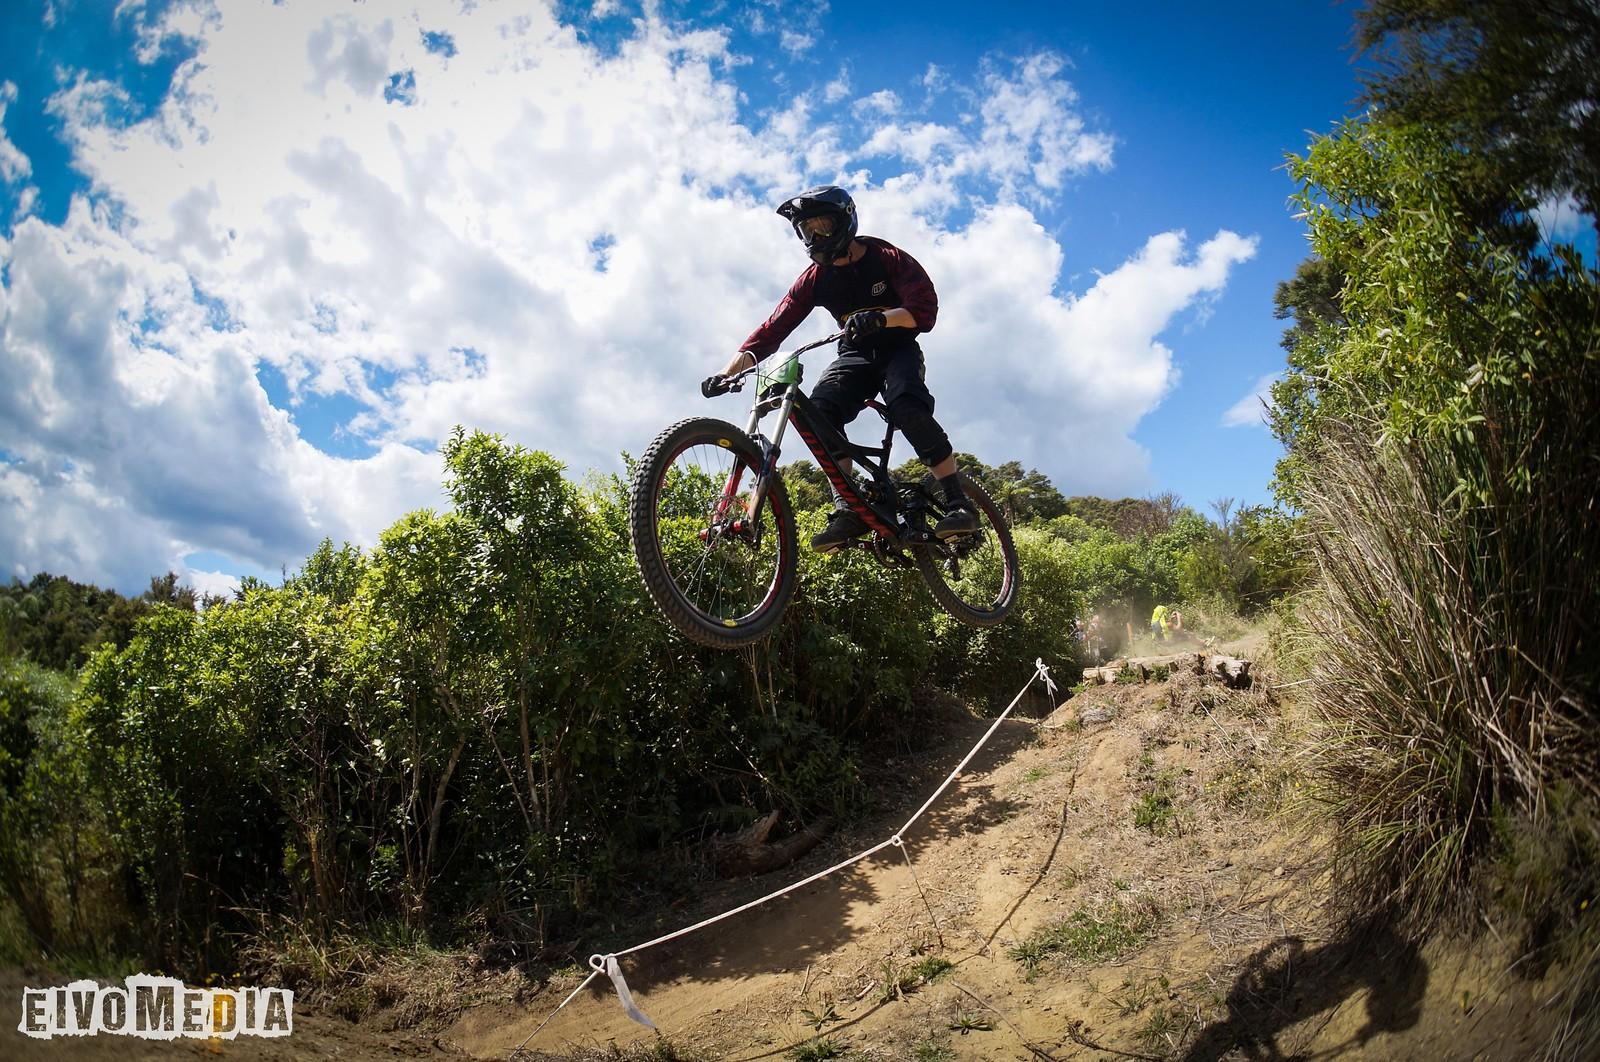 Hunua DH-3 - EIVOMEDIA - Mountain Biking Pictures - Vital MTB